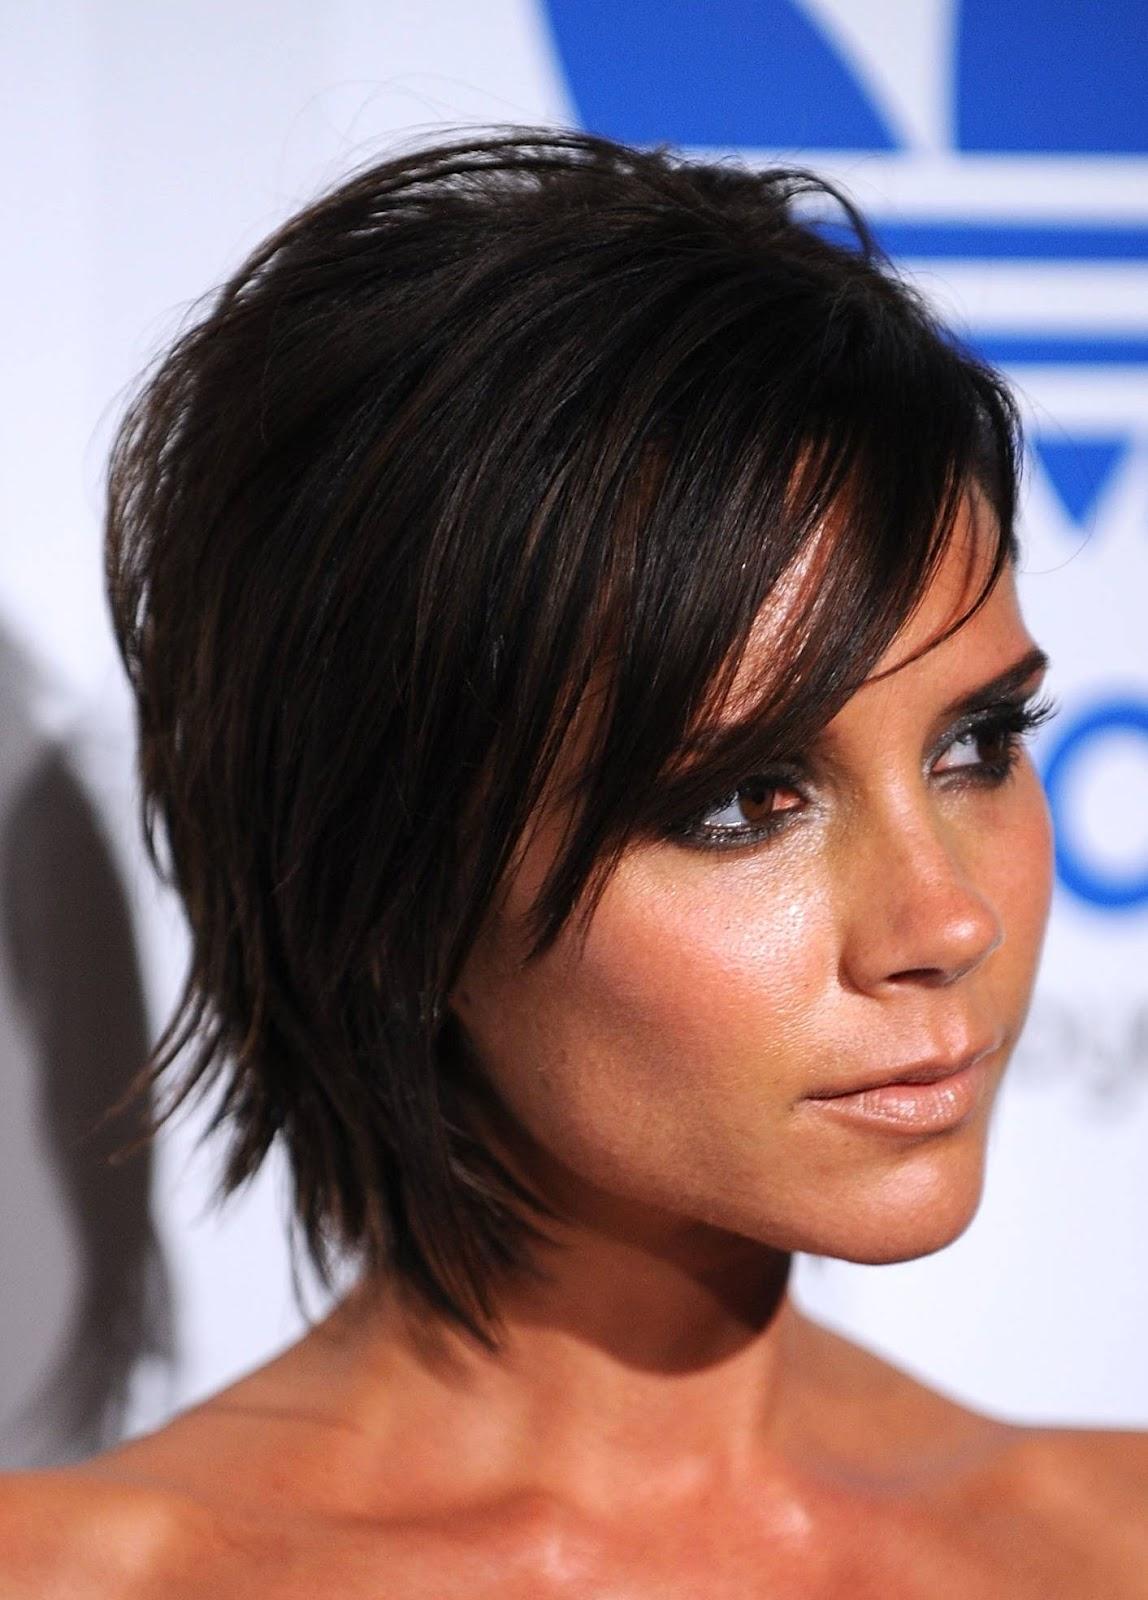 celebrity hairstyle victoria beckham medium haircut. Black Bedroom Furniture Sets. Home Design Ideas